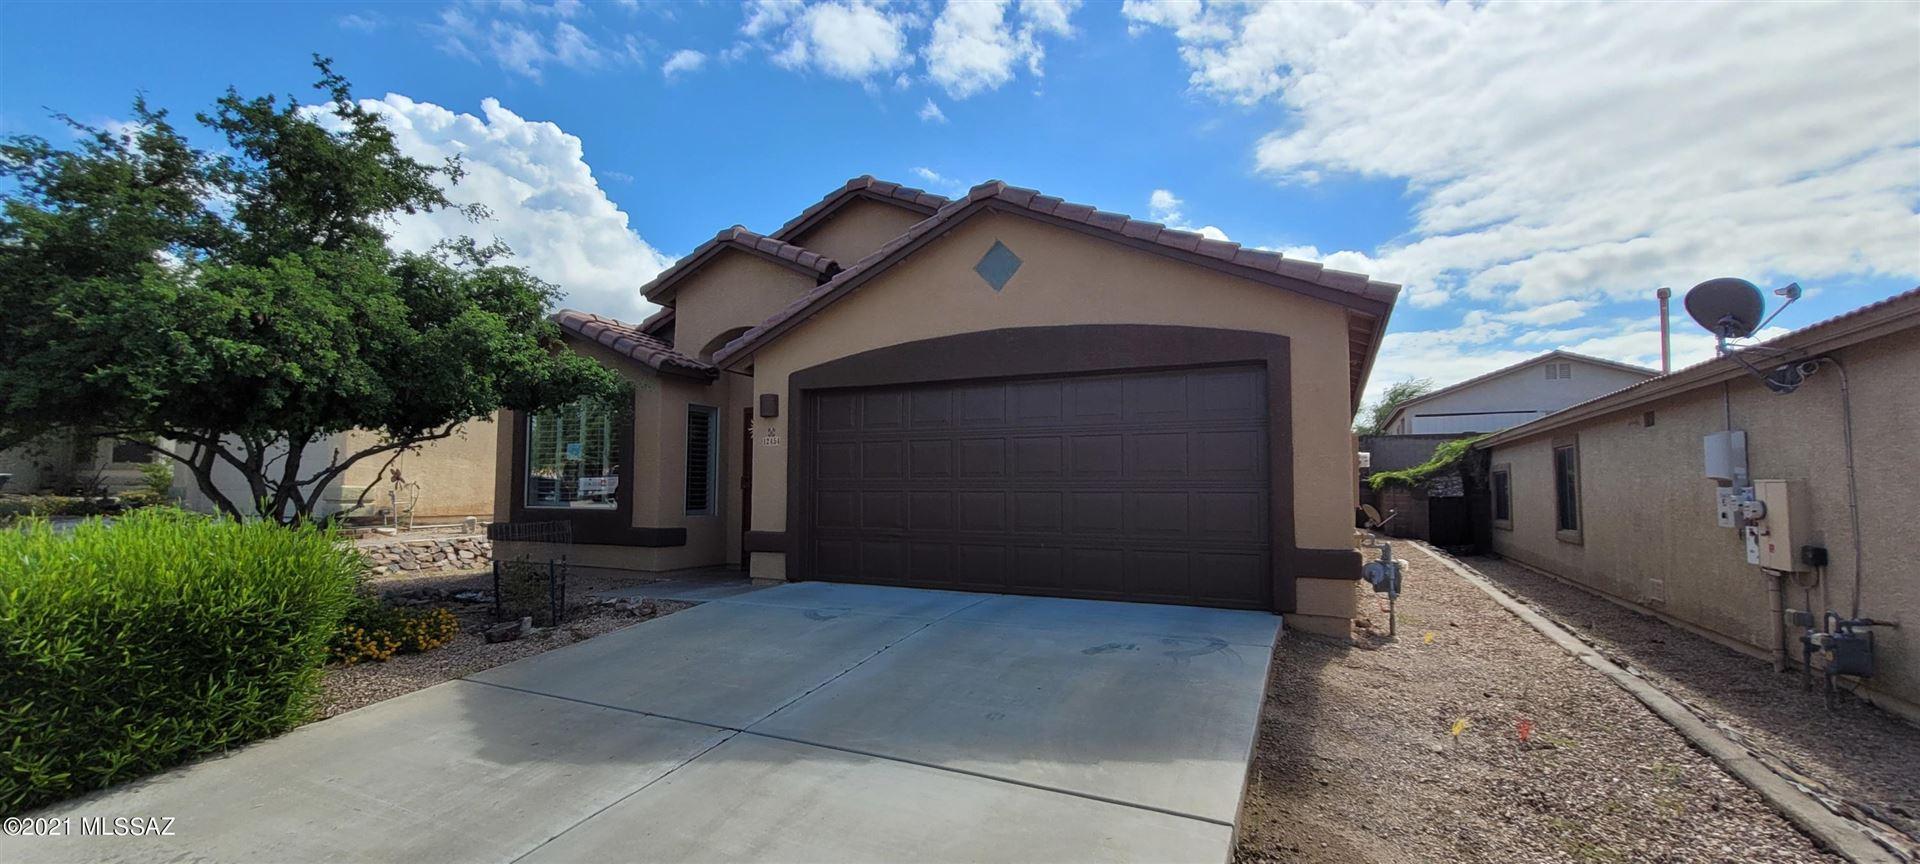 12454 N Crimson Vista Drive, Marana, AZ 85658 - MLS#: 22121016